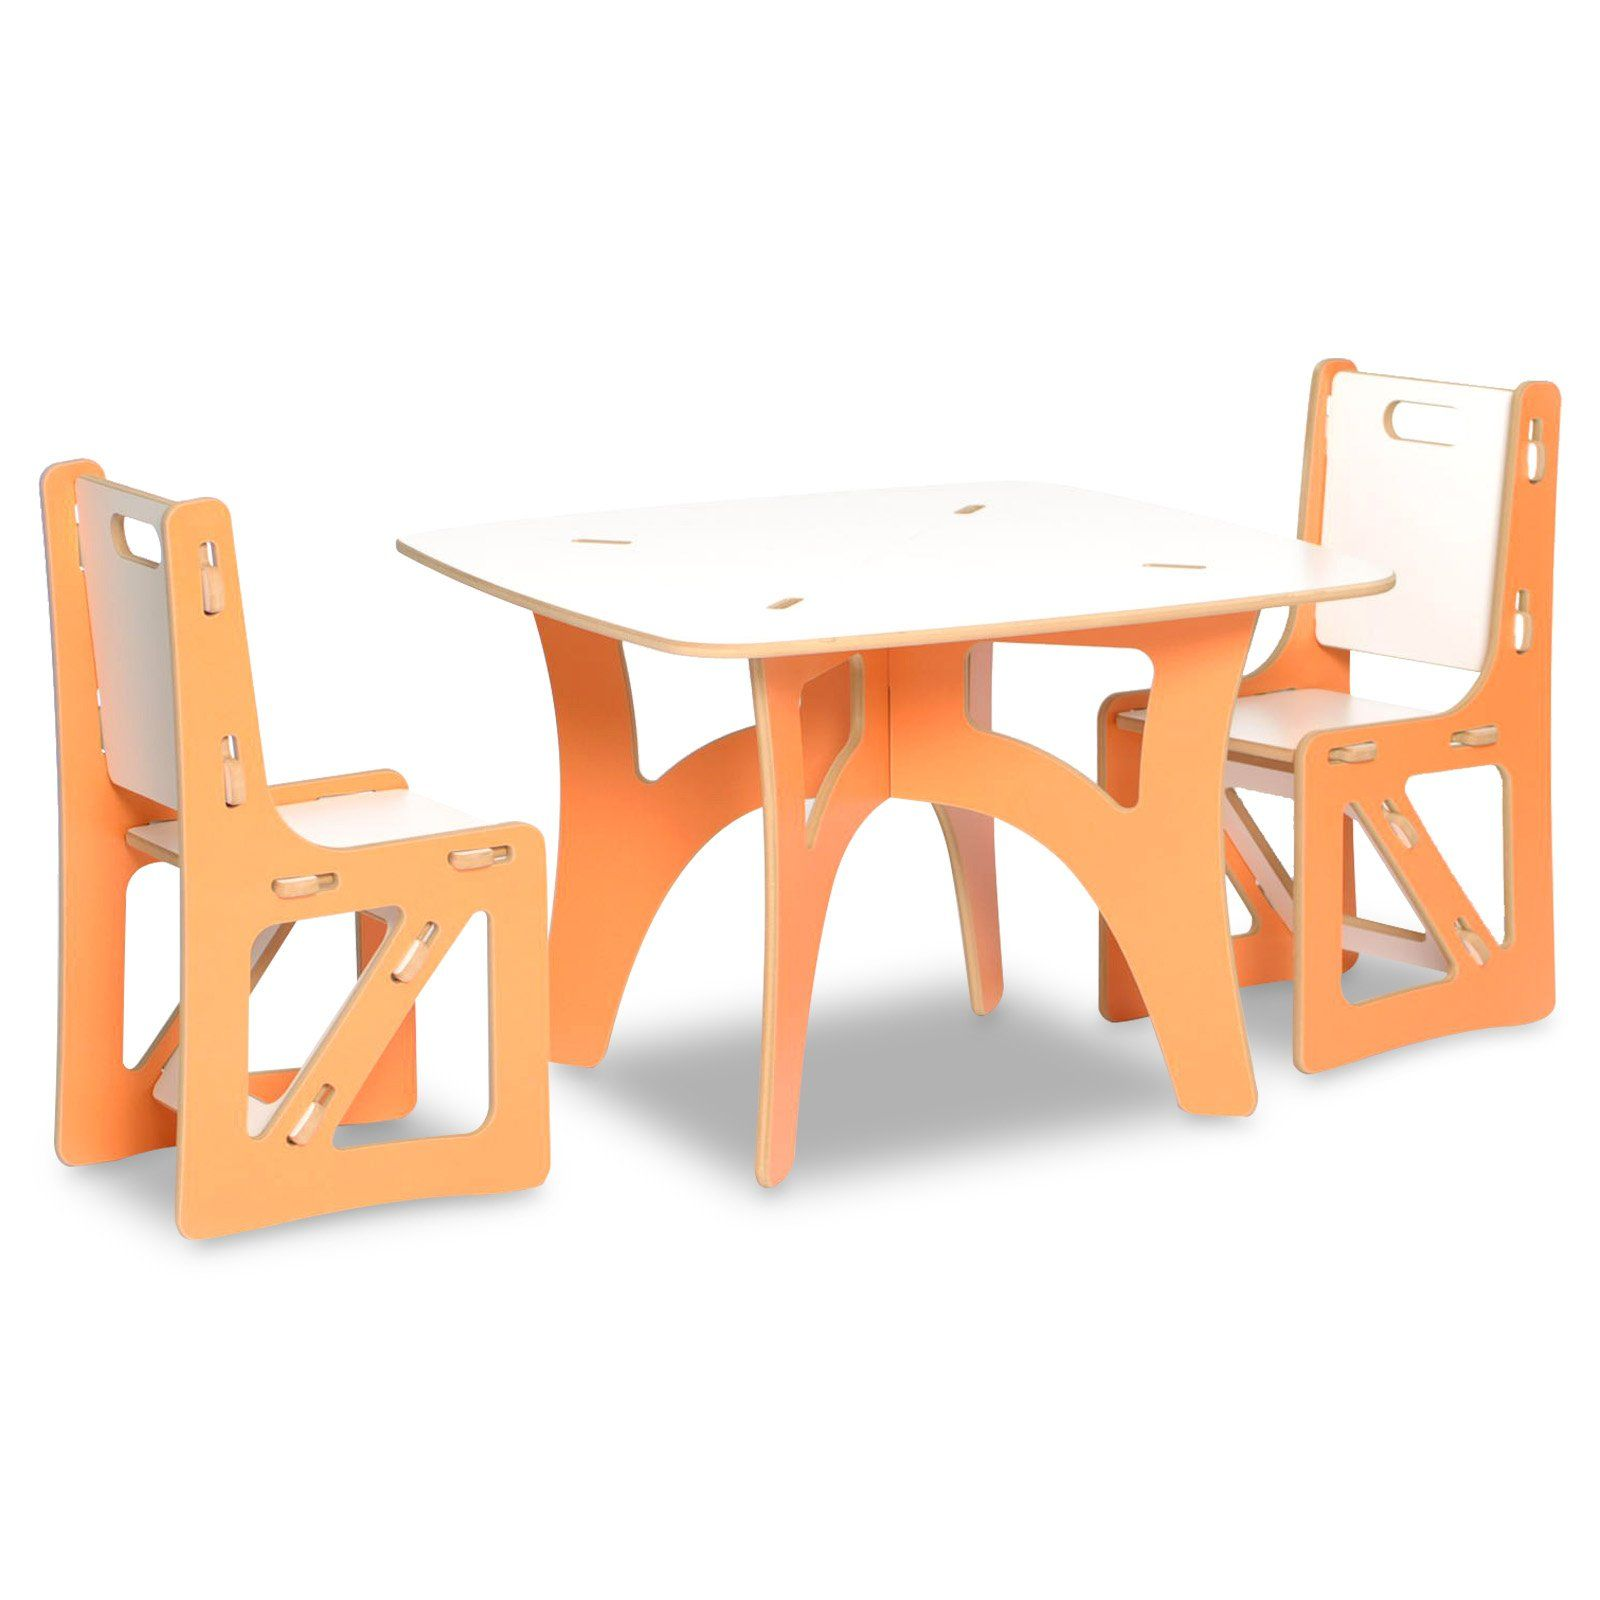 Kids Table And Chairs Set Orange White Kids Table And Chairs Modern Kids Table